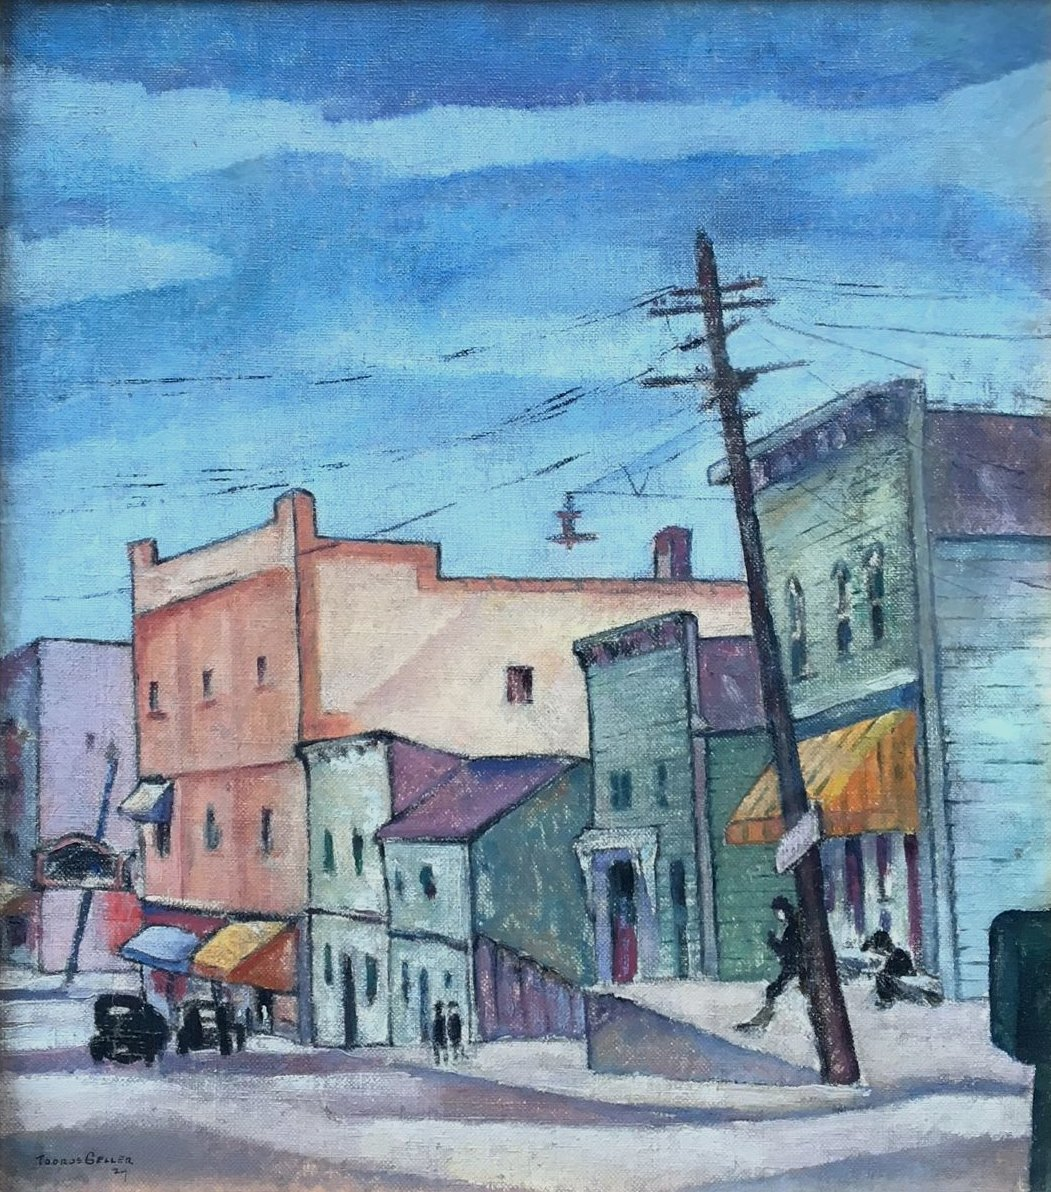 Untitled street scene. 1927.